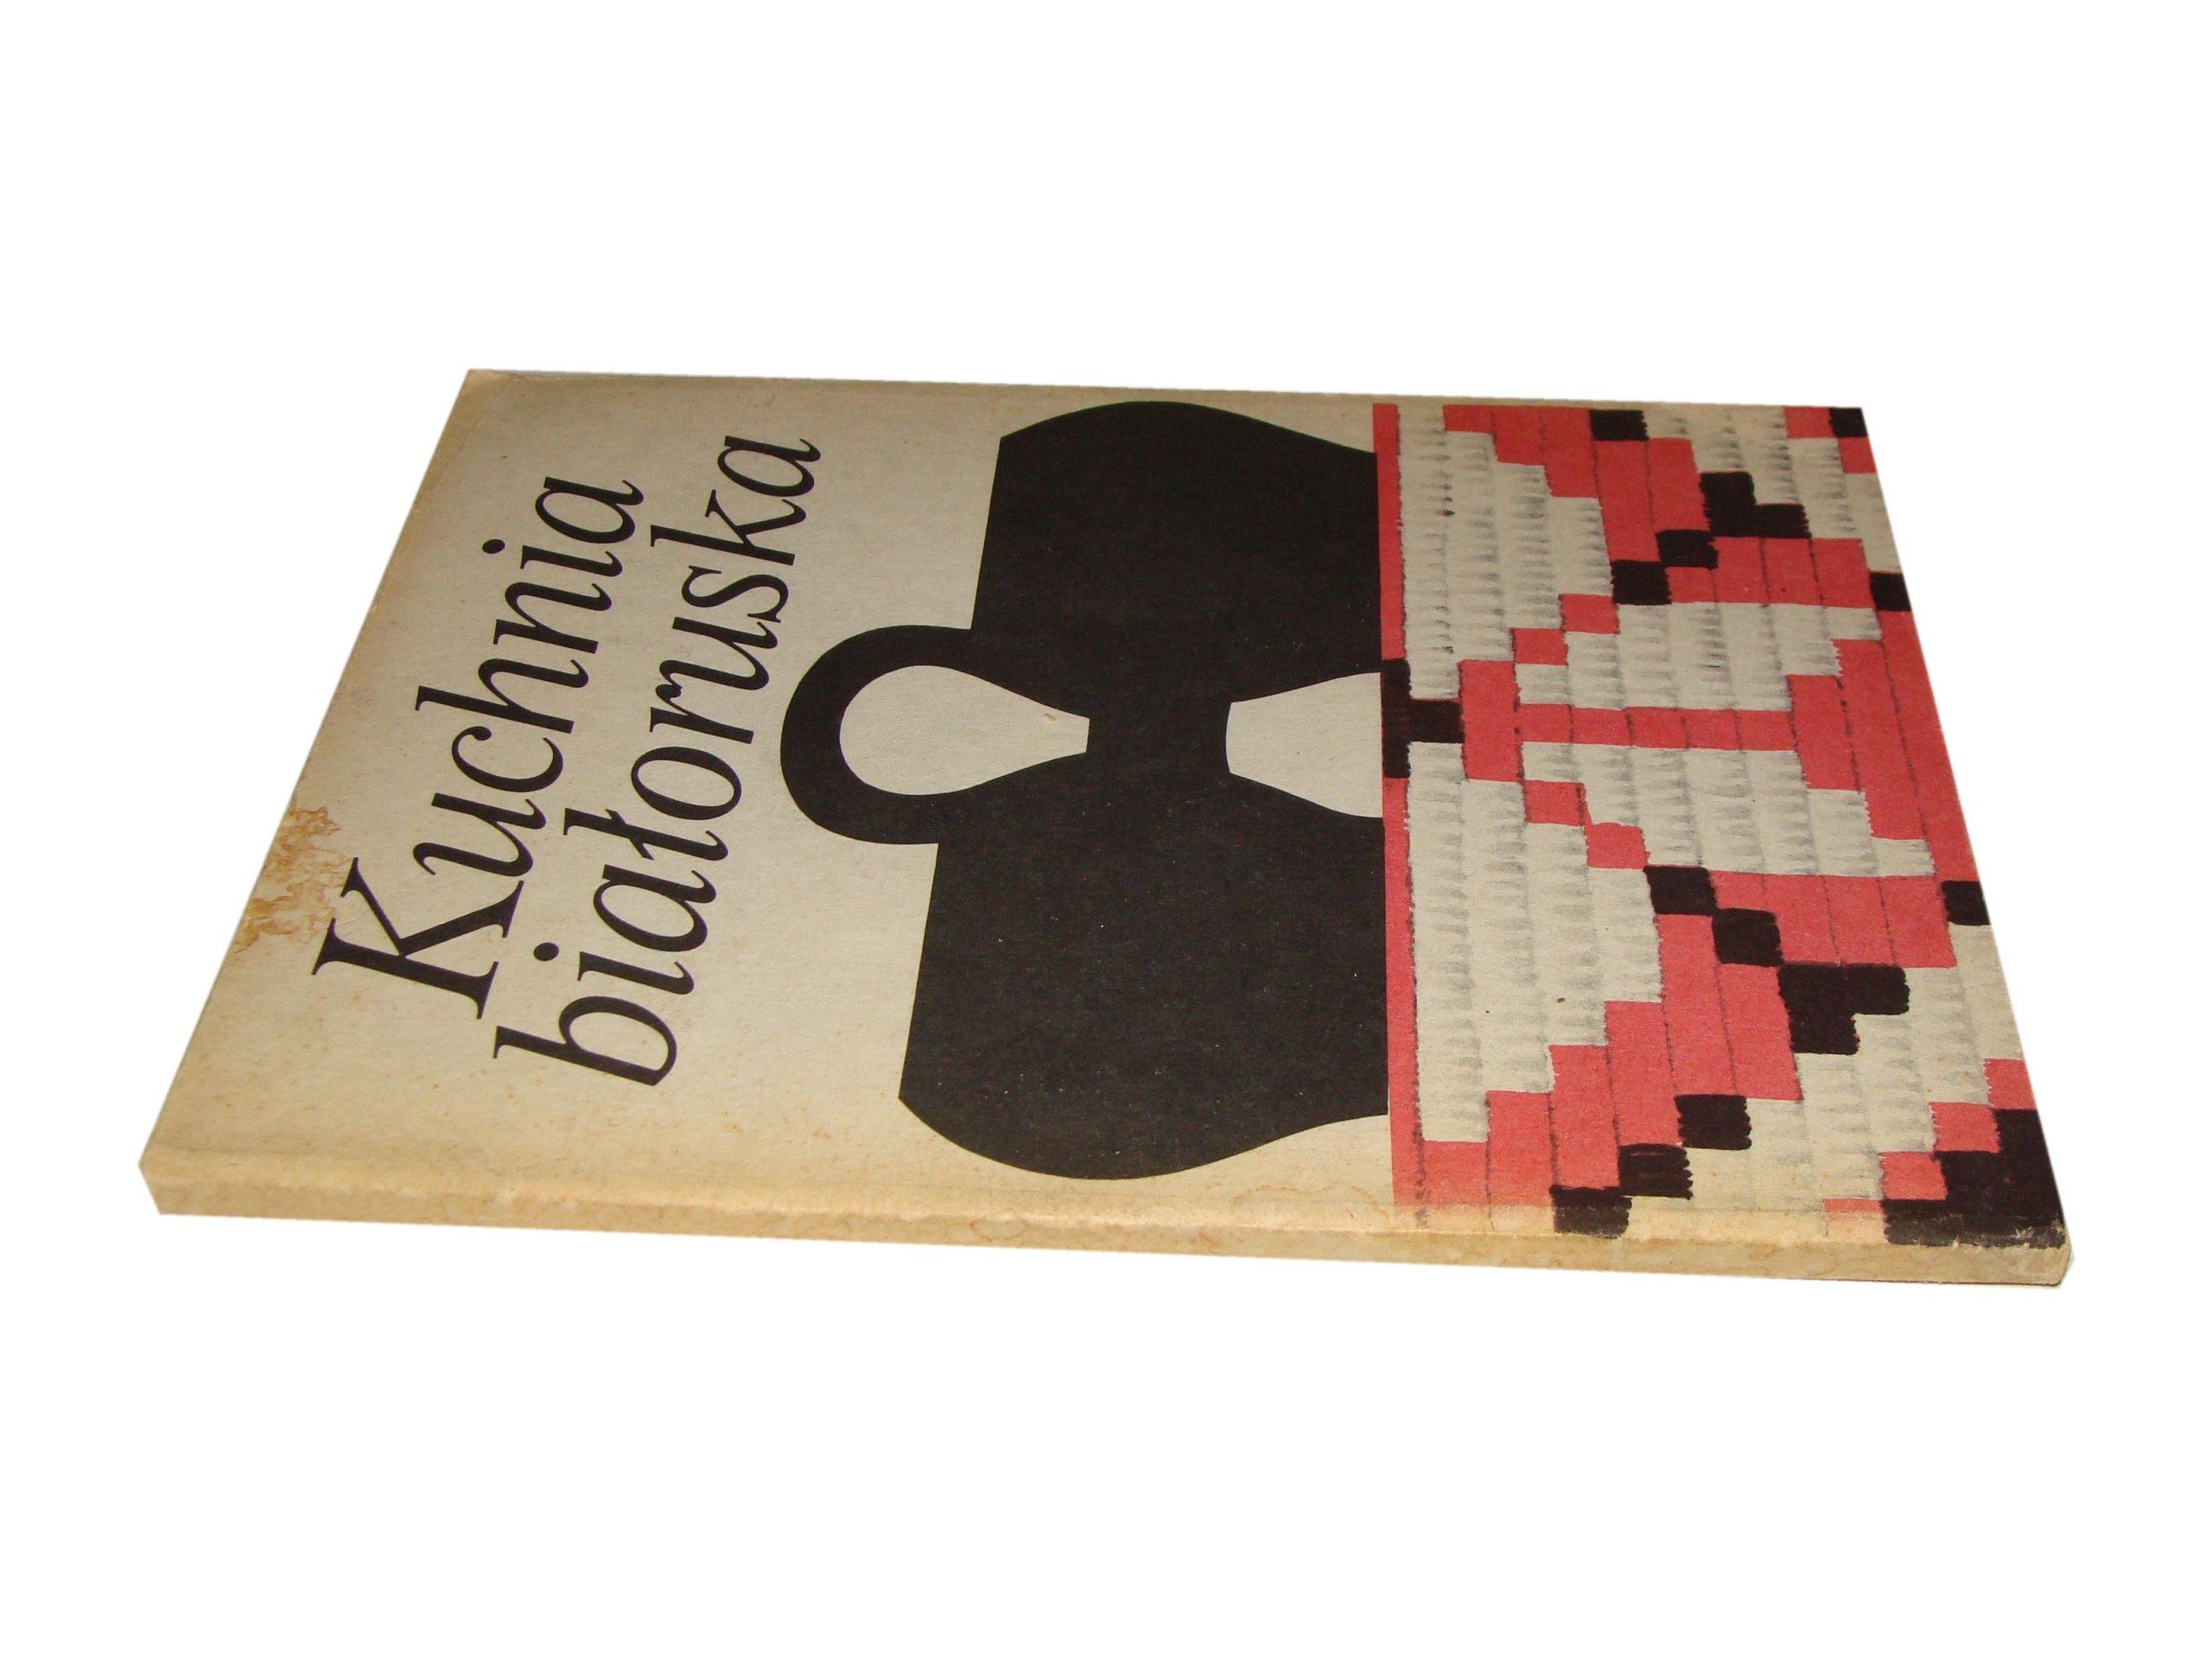 Kuchnia Białoruska 7233036320 Oficjalne Archiwum Allegro